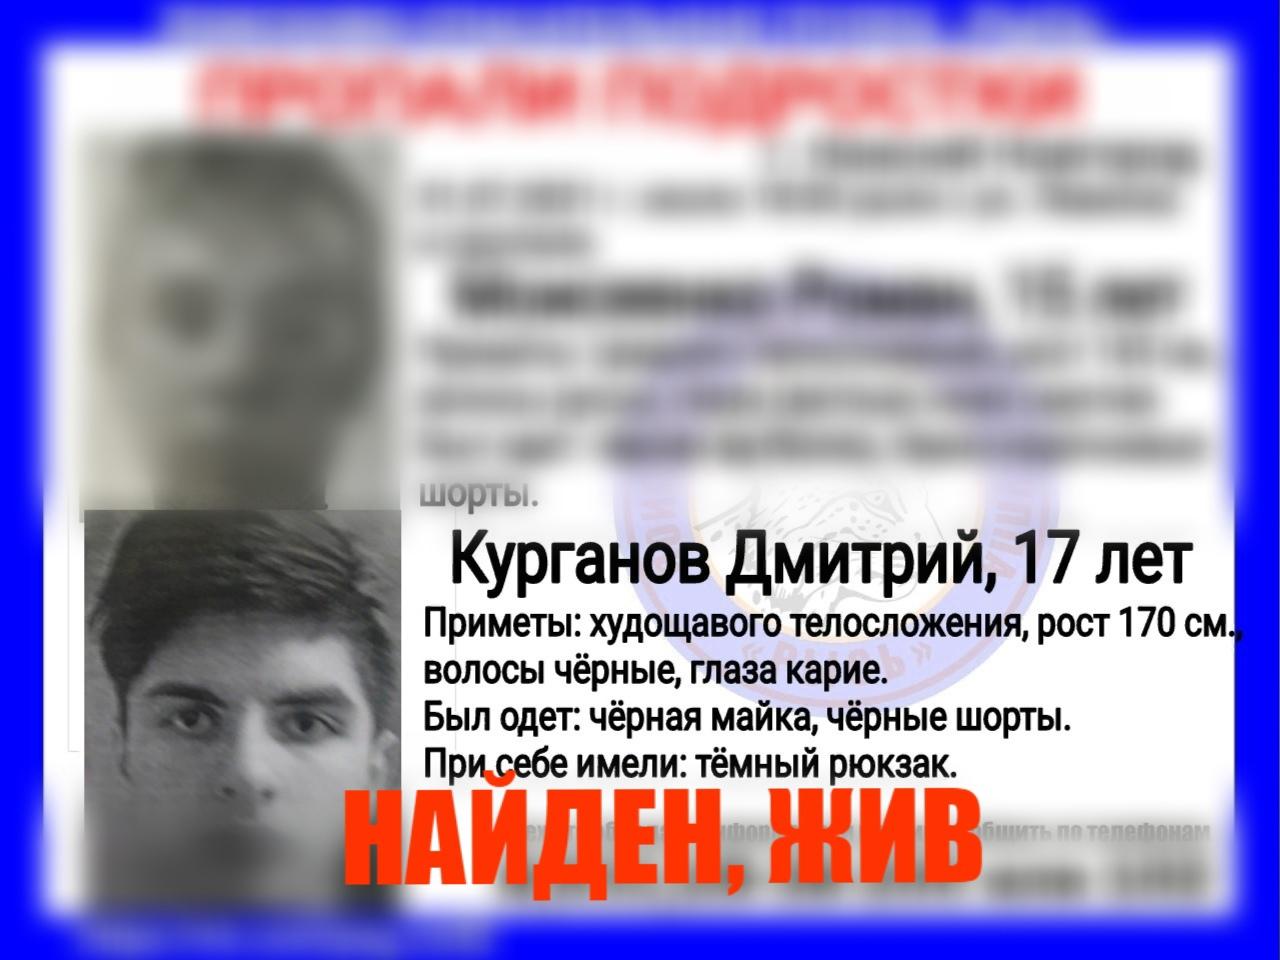 Моисеенко Роман, 15 лет, Курганов Дмитрий, 17 лет, г. Н. Новгород